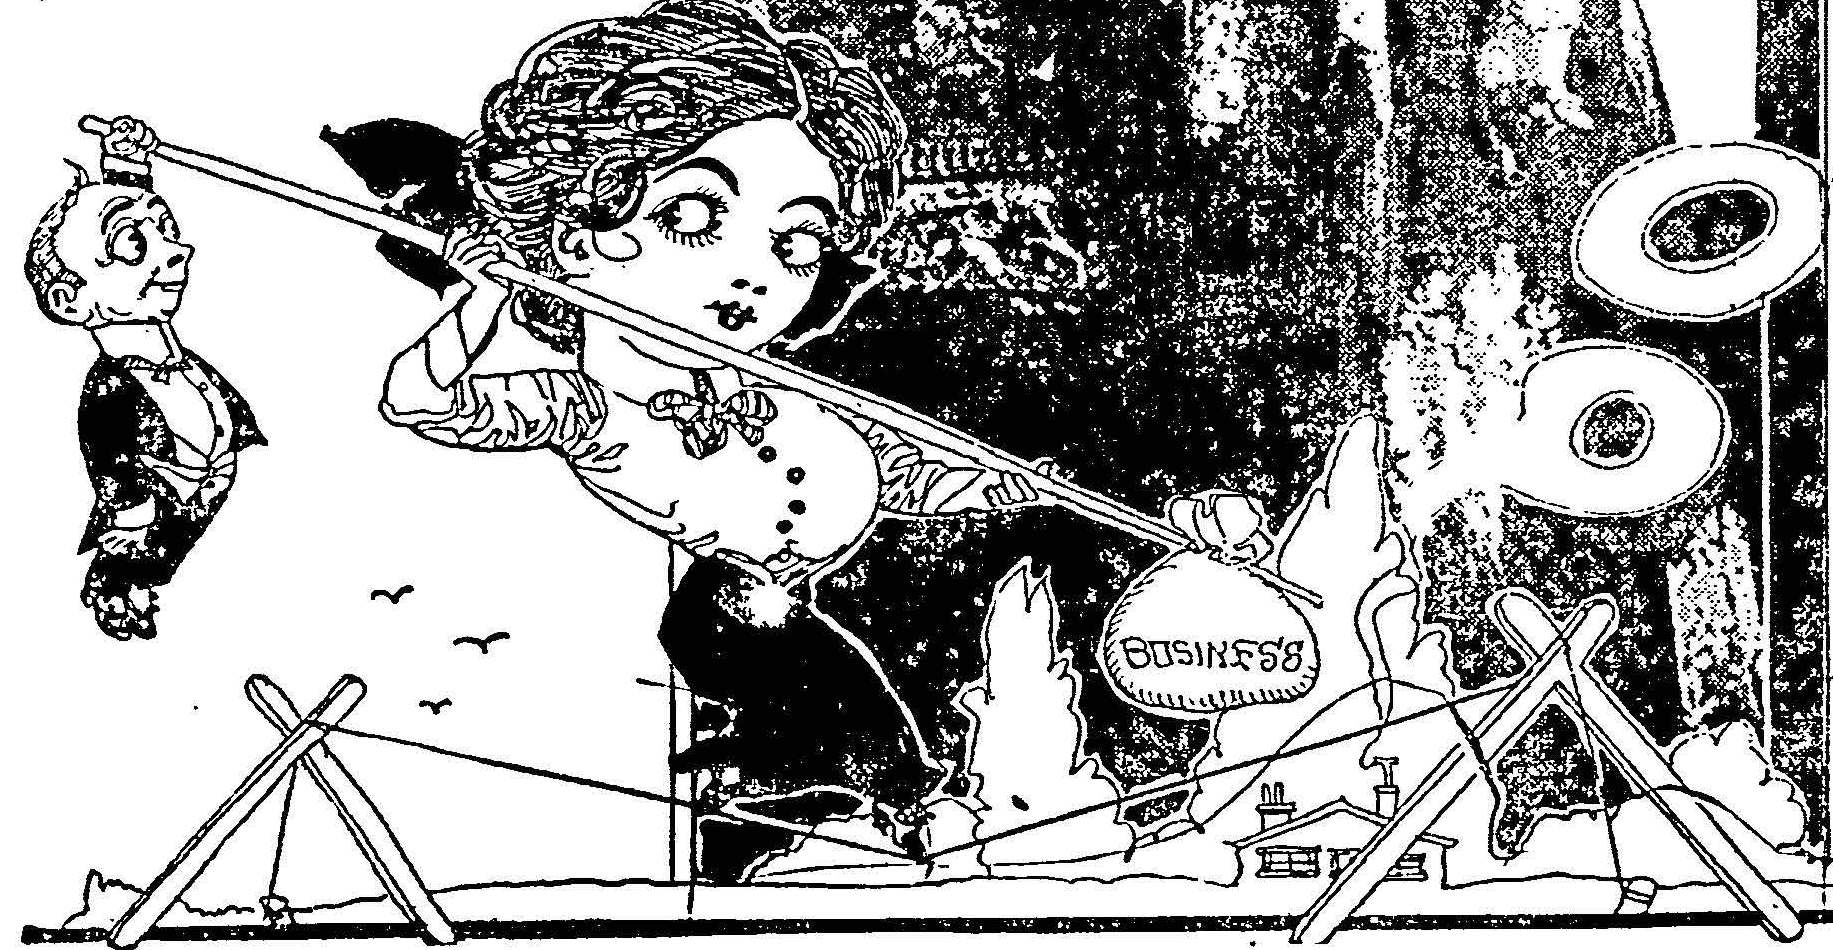 Idaho statesman newspaper online - From The Idaho Statesman April 30 1911 Source American Newspaper Archives